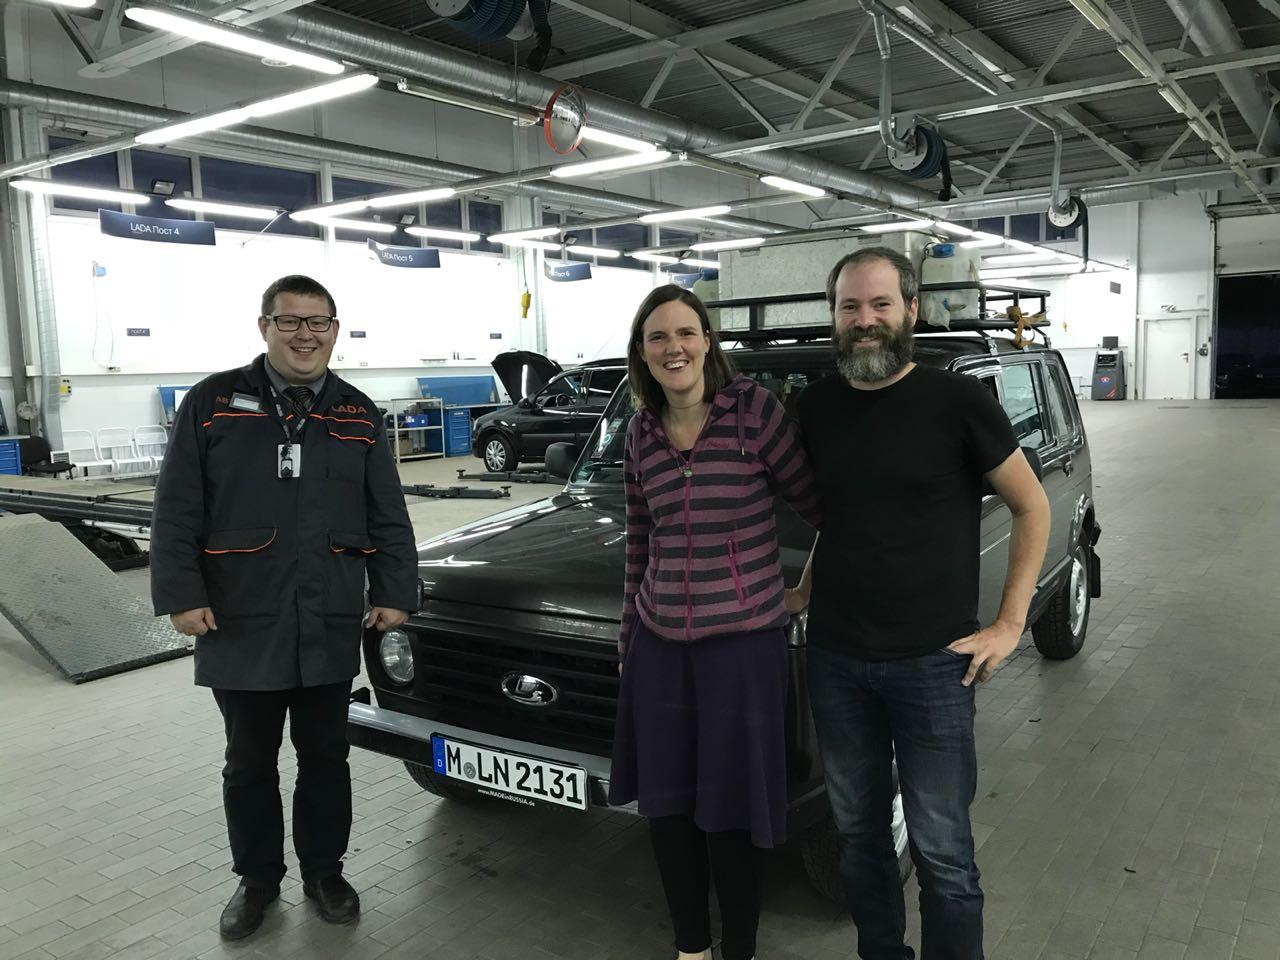 Семья из Мюнхена на Lada 4x4